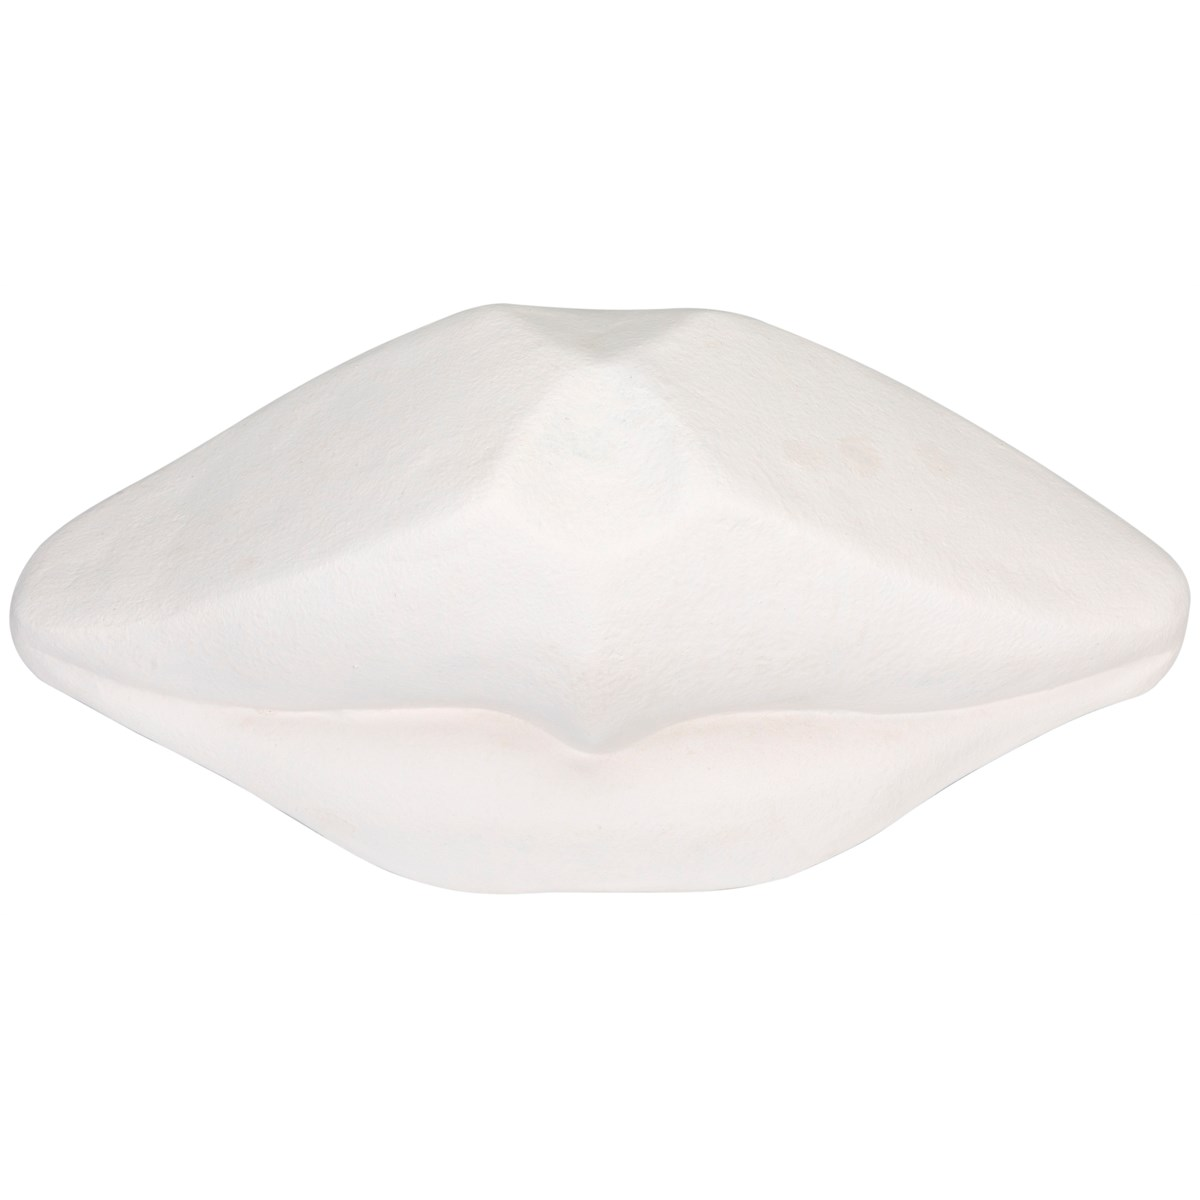 Lips, White Fiber Cement